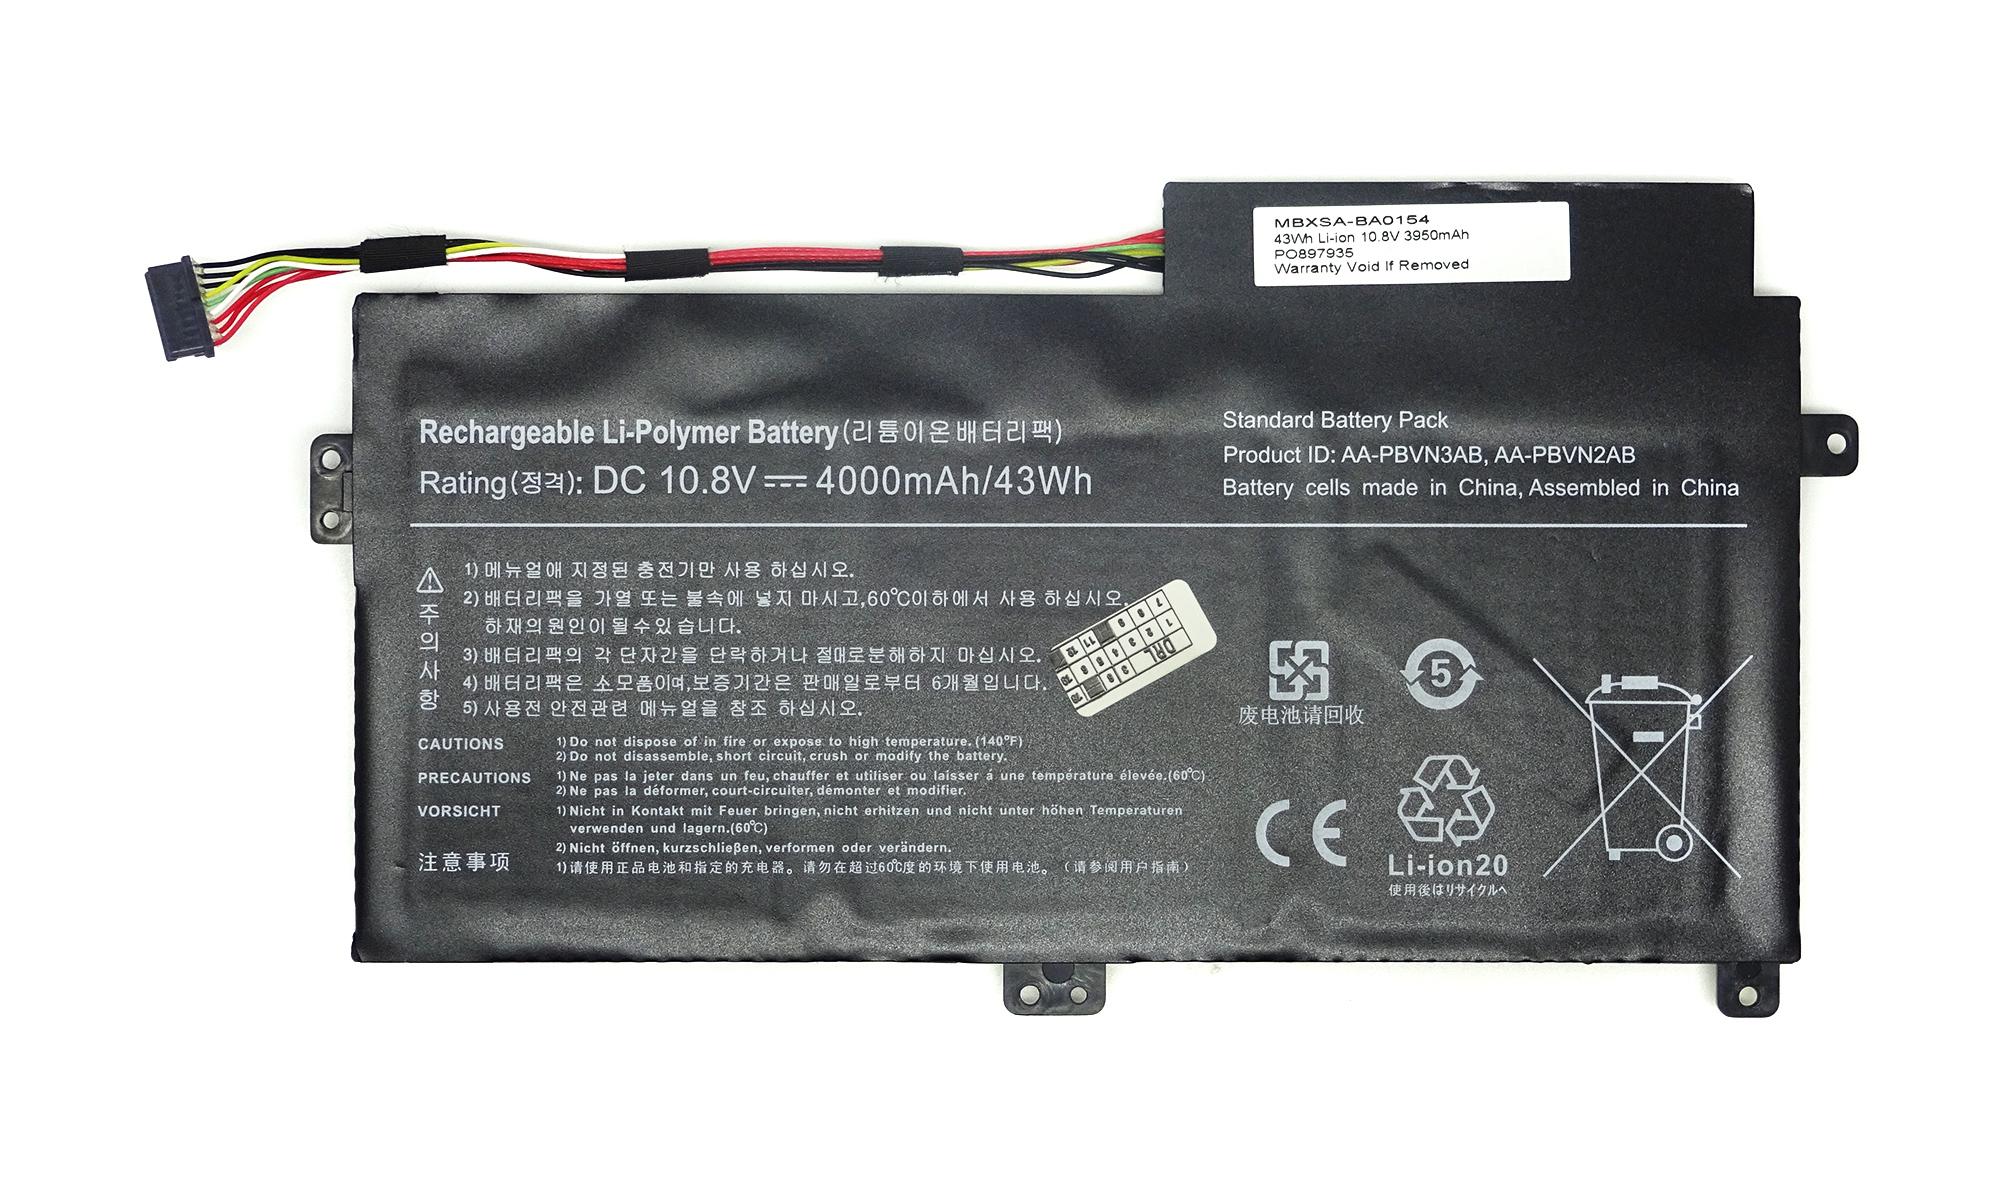 Baterie compatibila Samsung Series 3 NP370R4E, NP370R5E, ATIV Book 4 NP470R5E, Series 5 NP510R5E, model AA-PBVN3AB